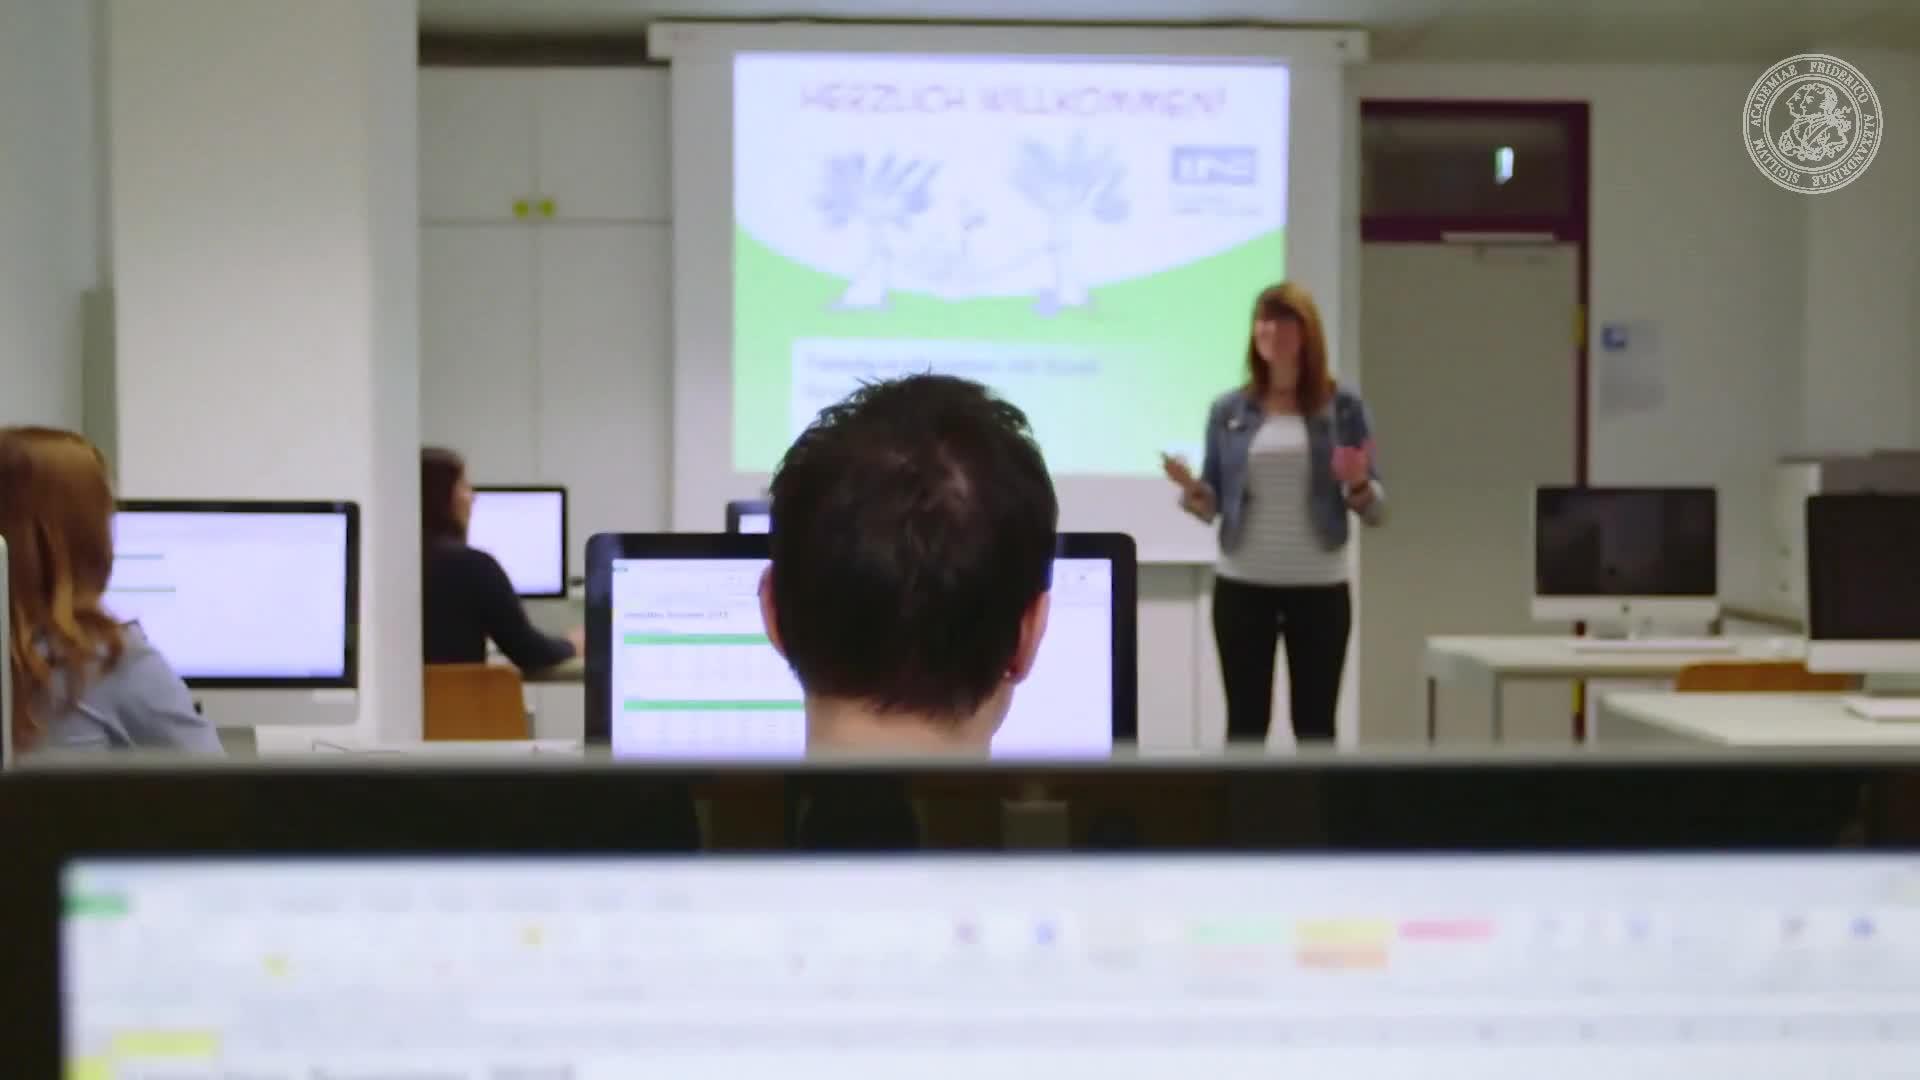 IT-Schulungszentrum preview image